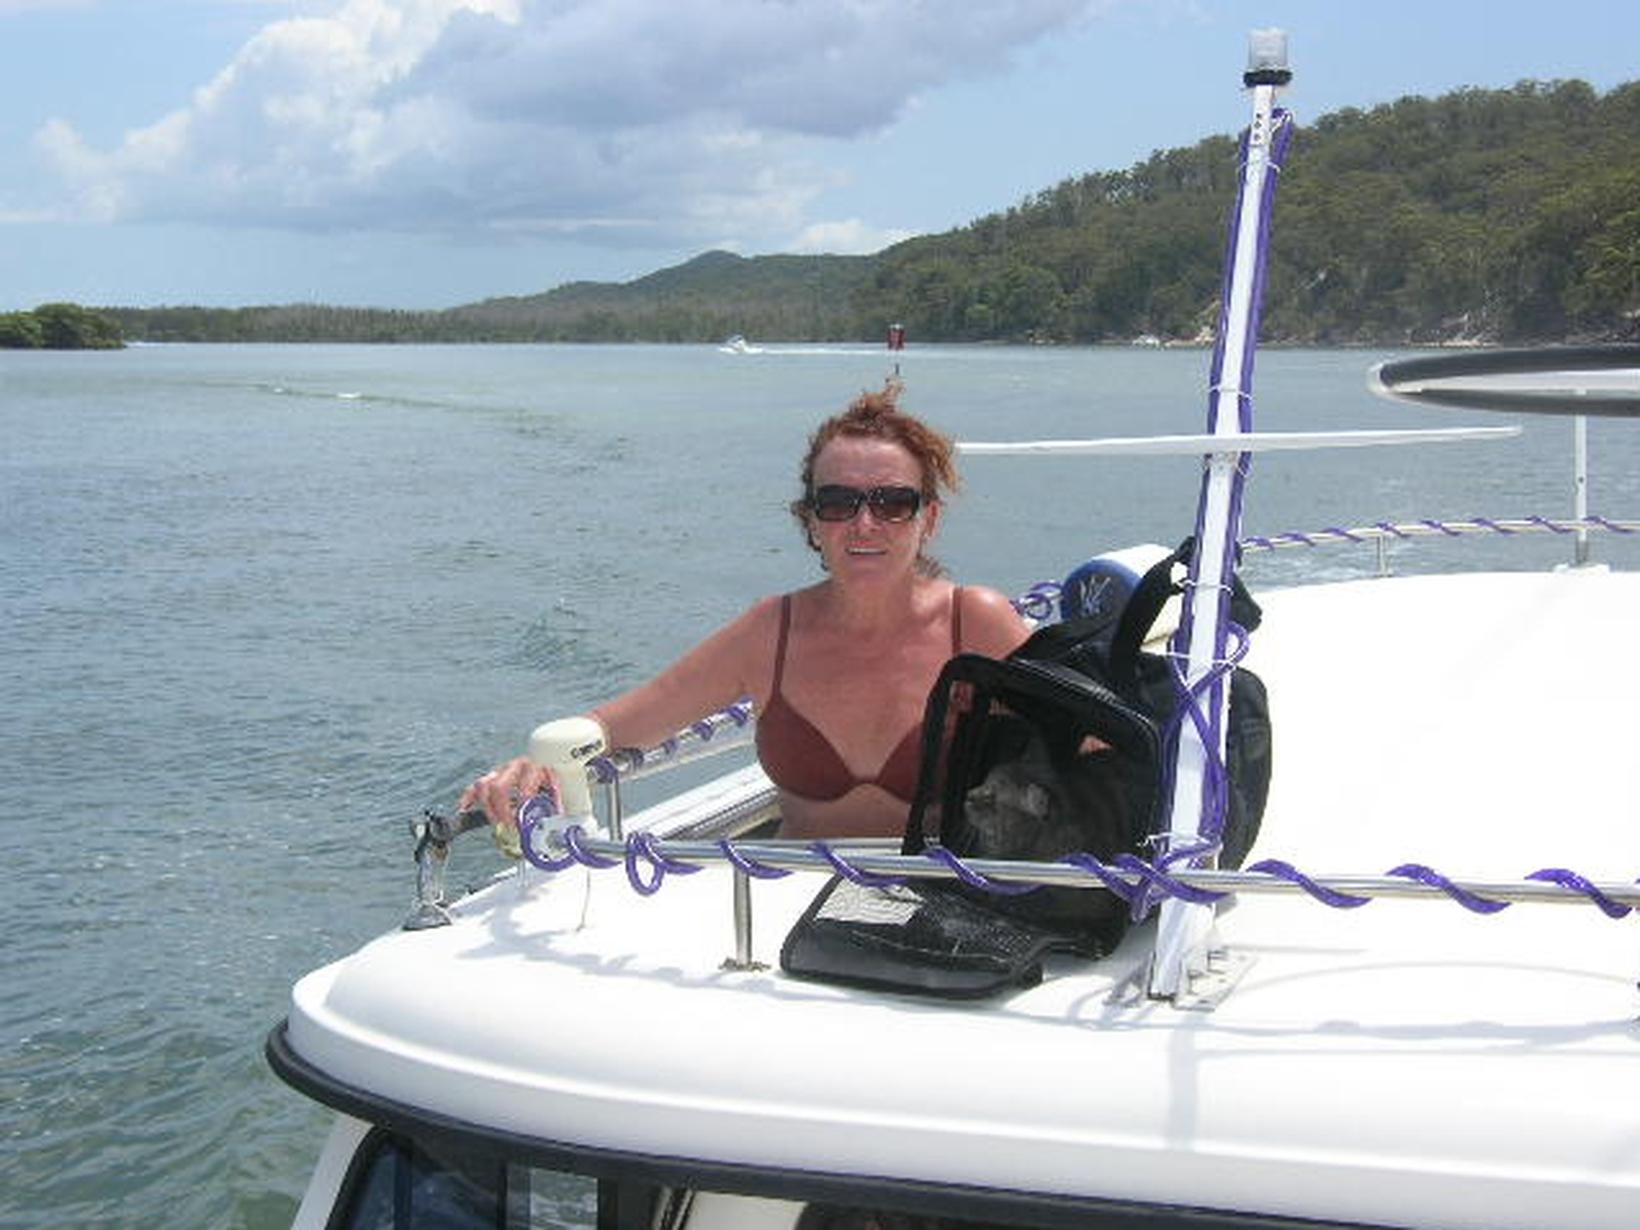 Lesley from Labrador, Queensland, Australia